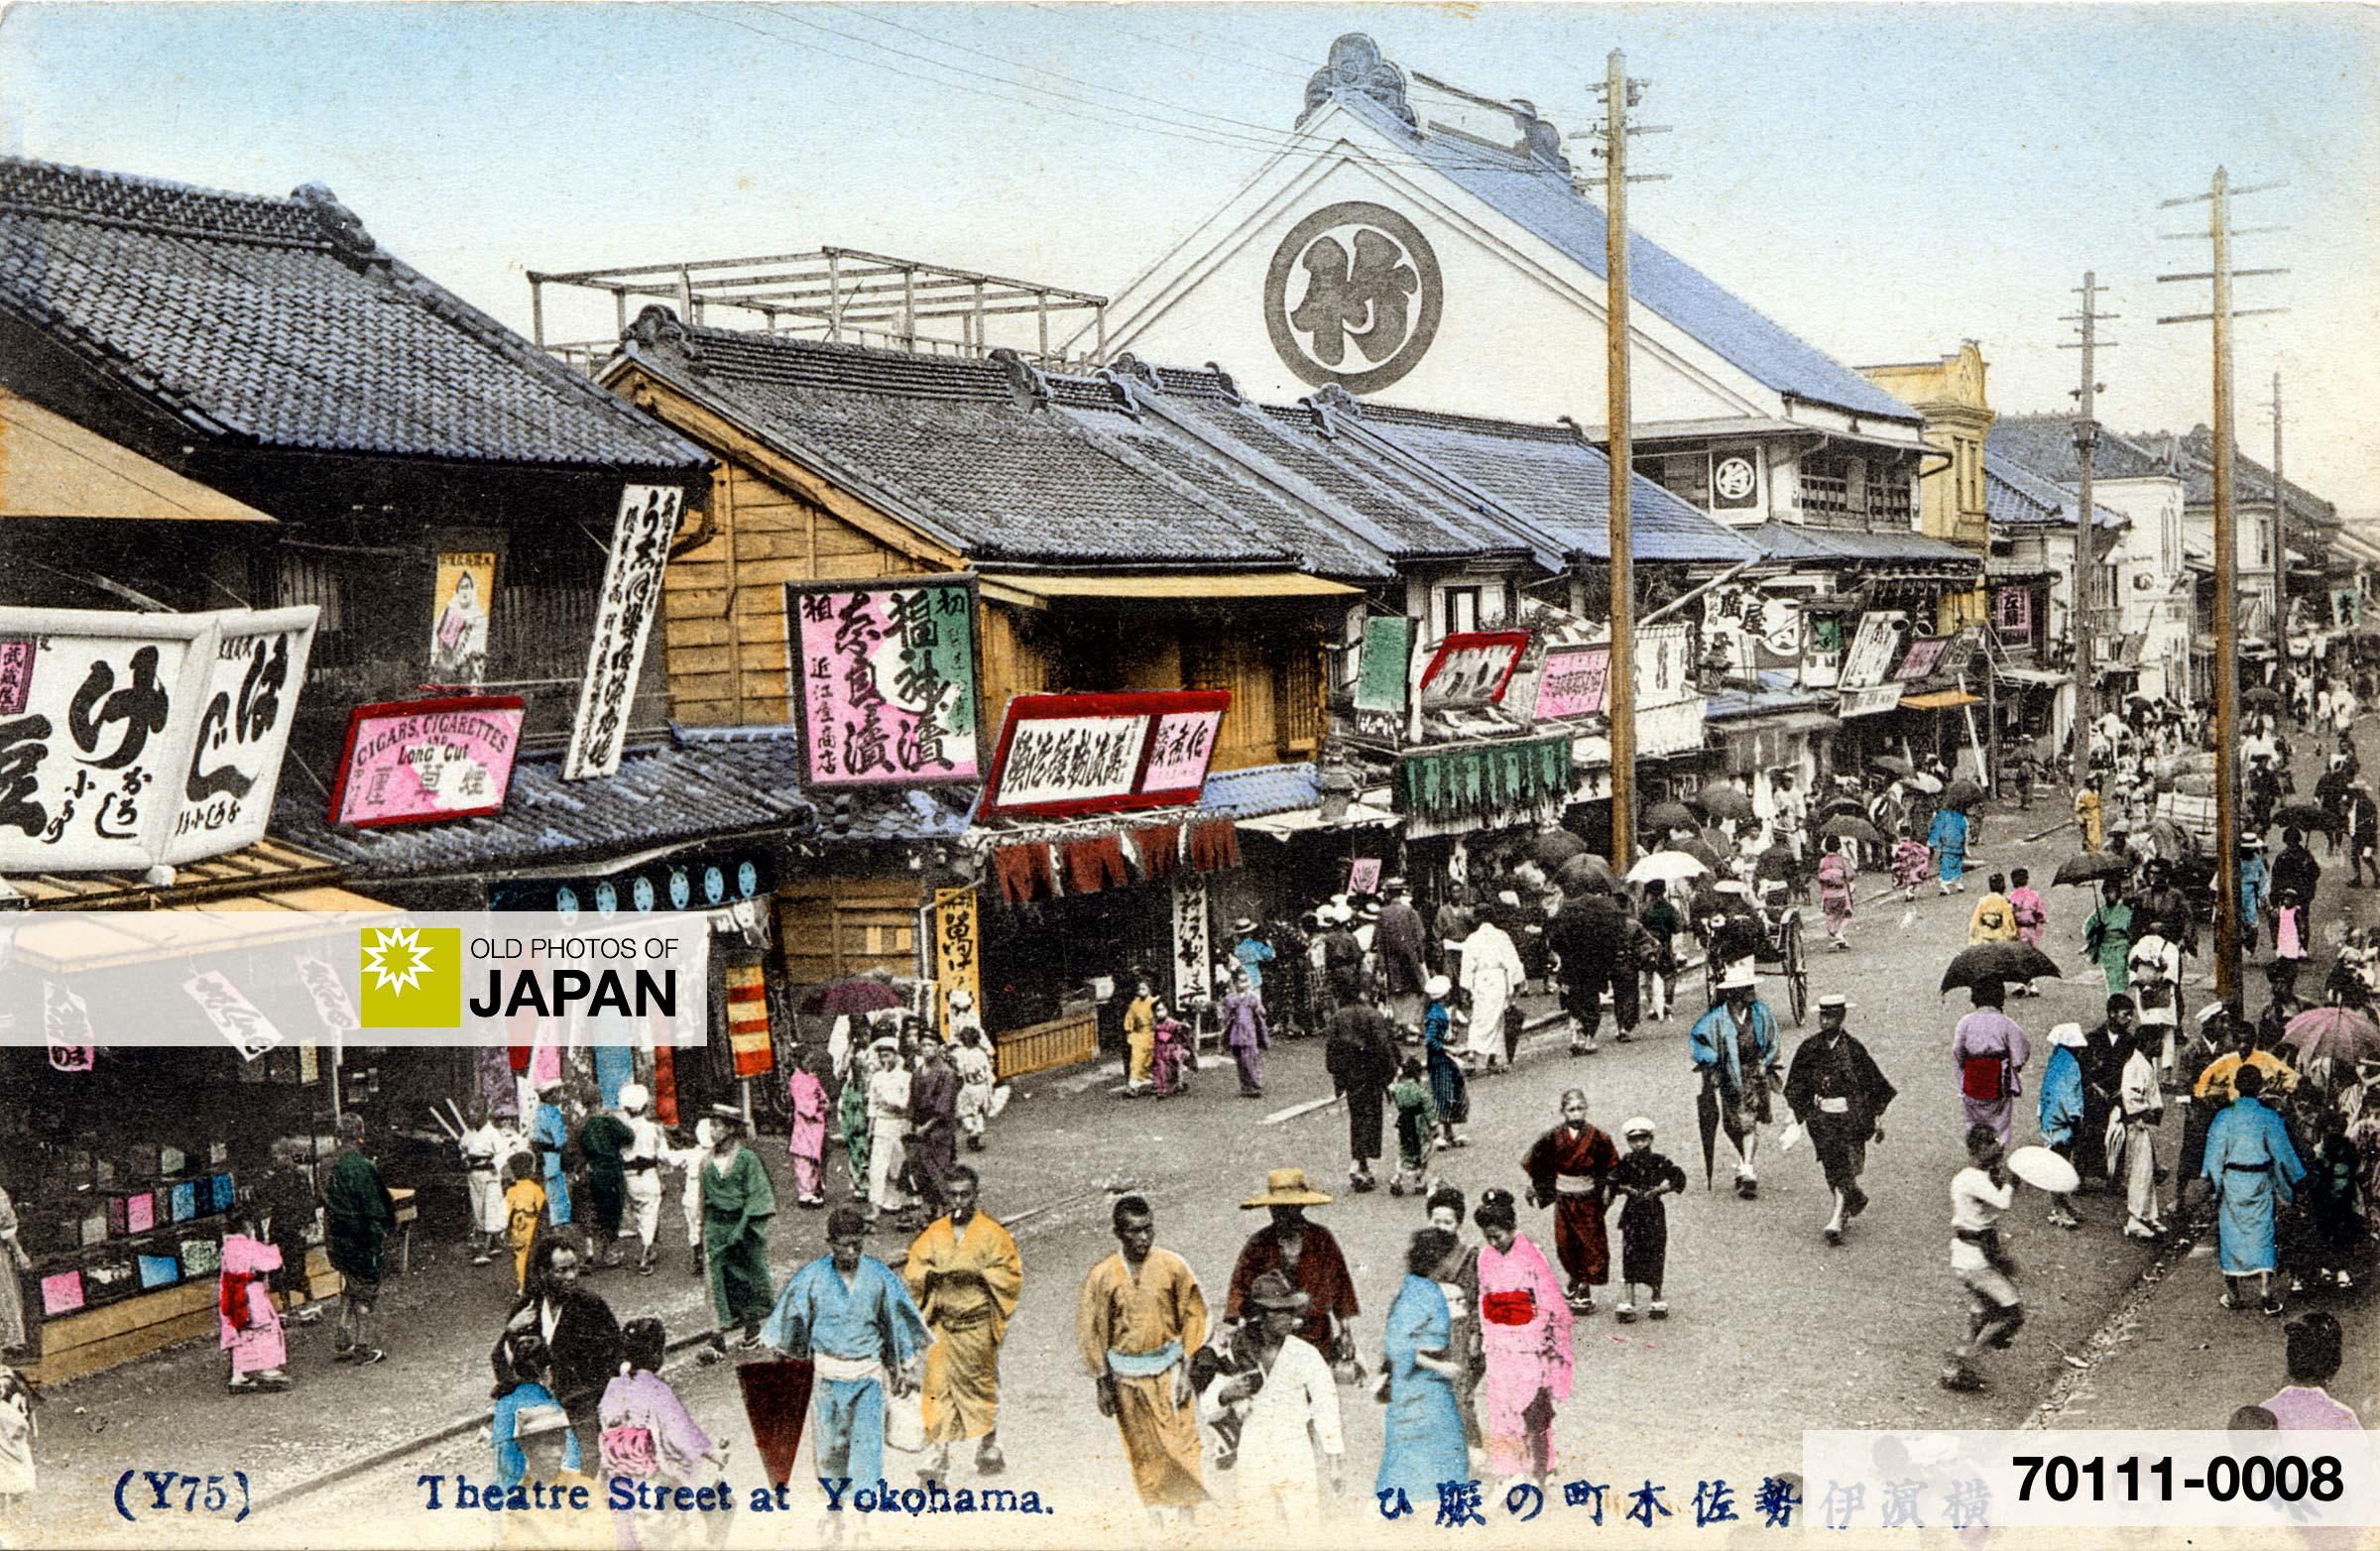 Isezaki-cho, Yokohama